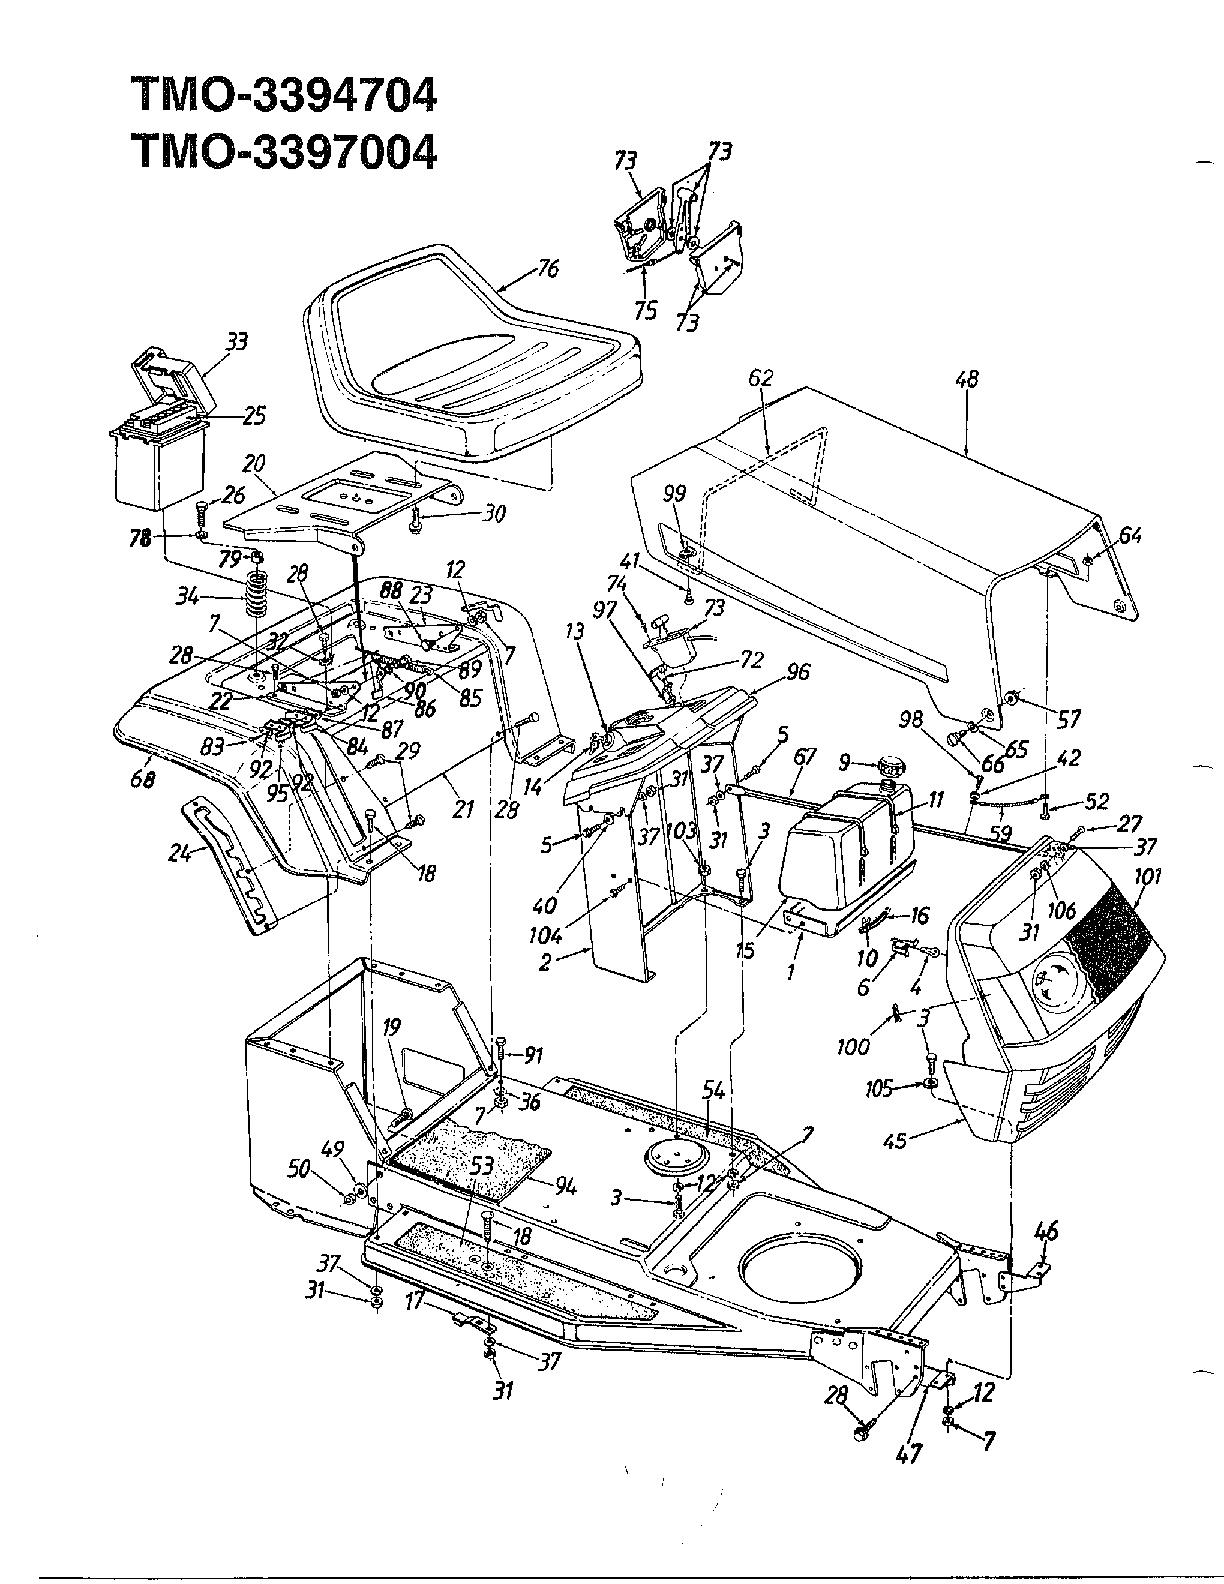 small resolution of mtd tractor diagram wiring diagram used bolens mtd lawn tractor belt diagram mtd lawn tractor diagram